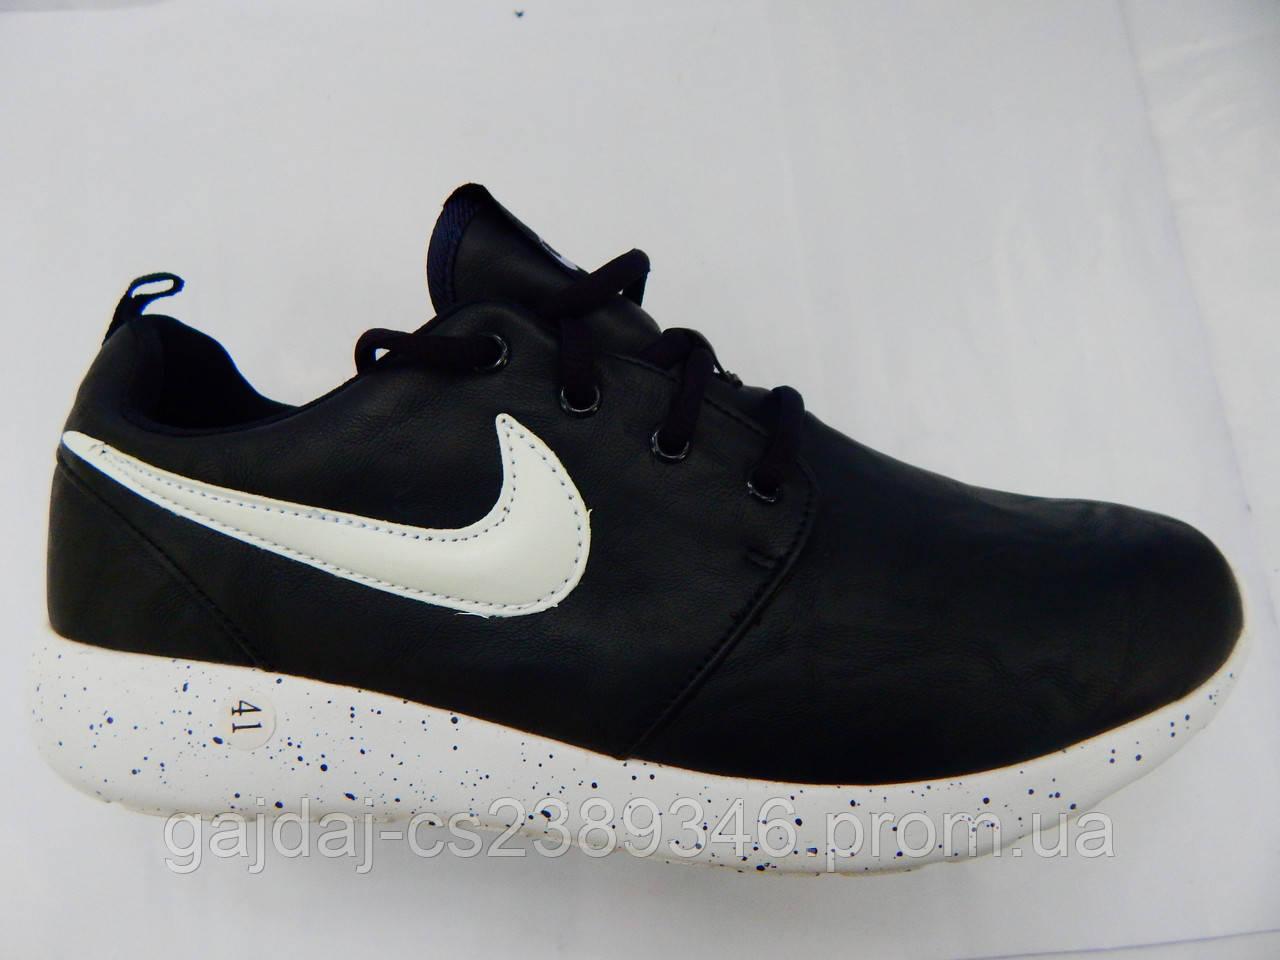 fb517a6e Молодежные кроссовки